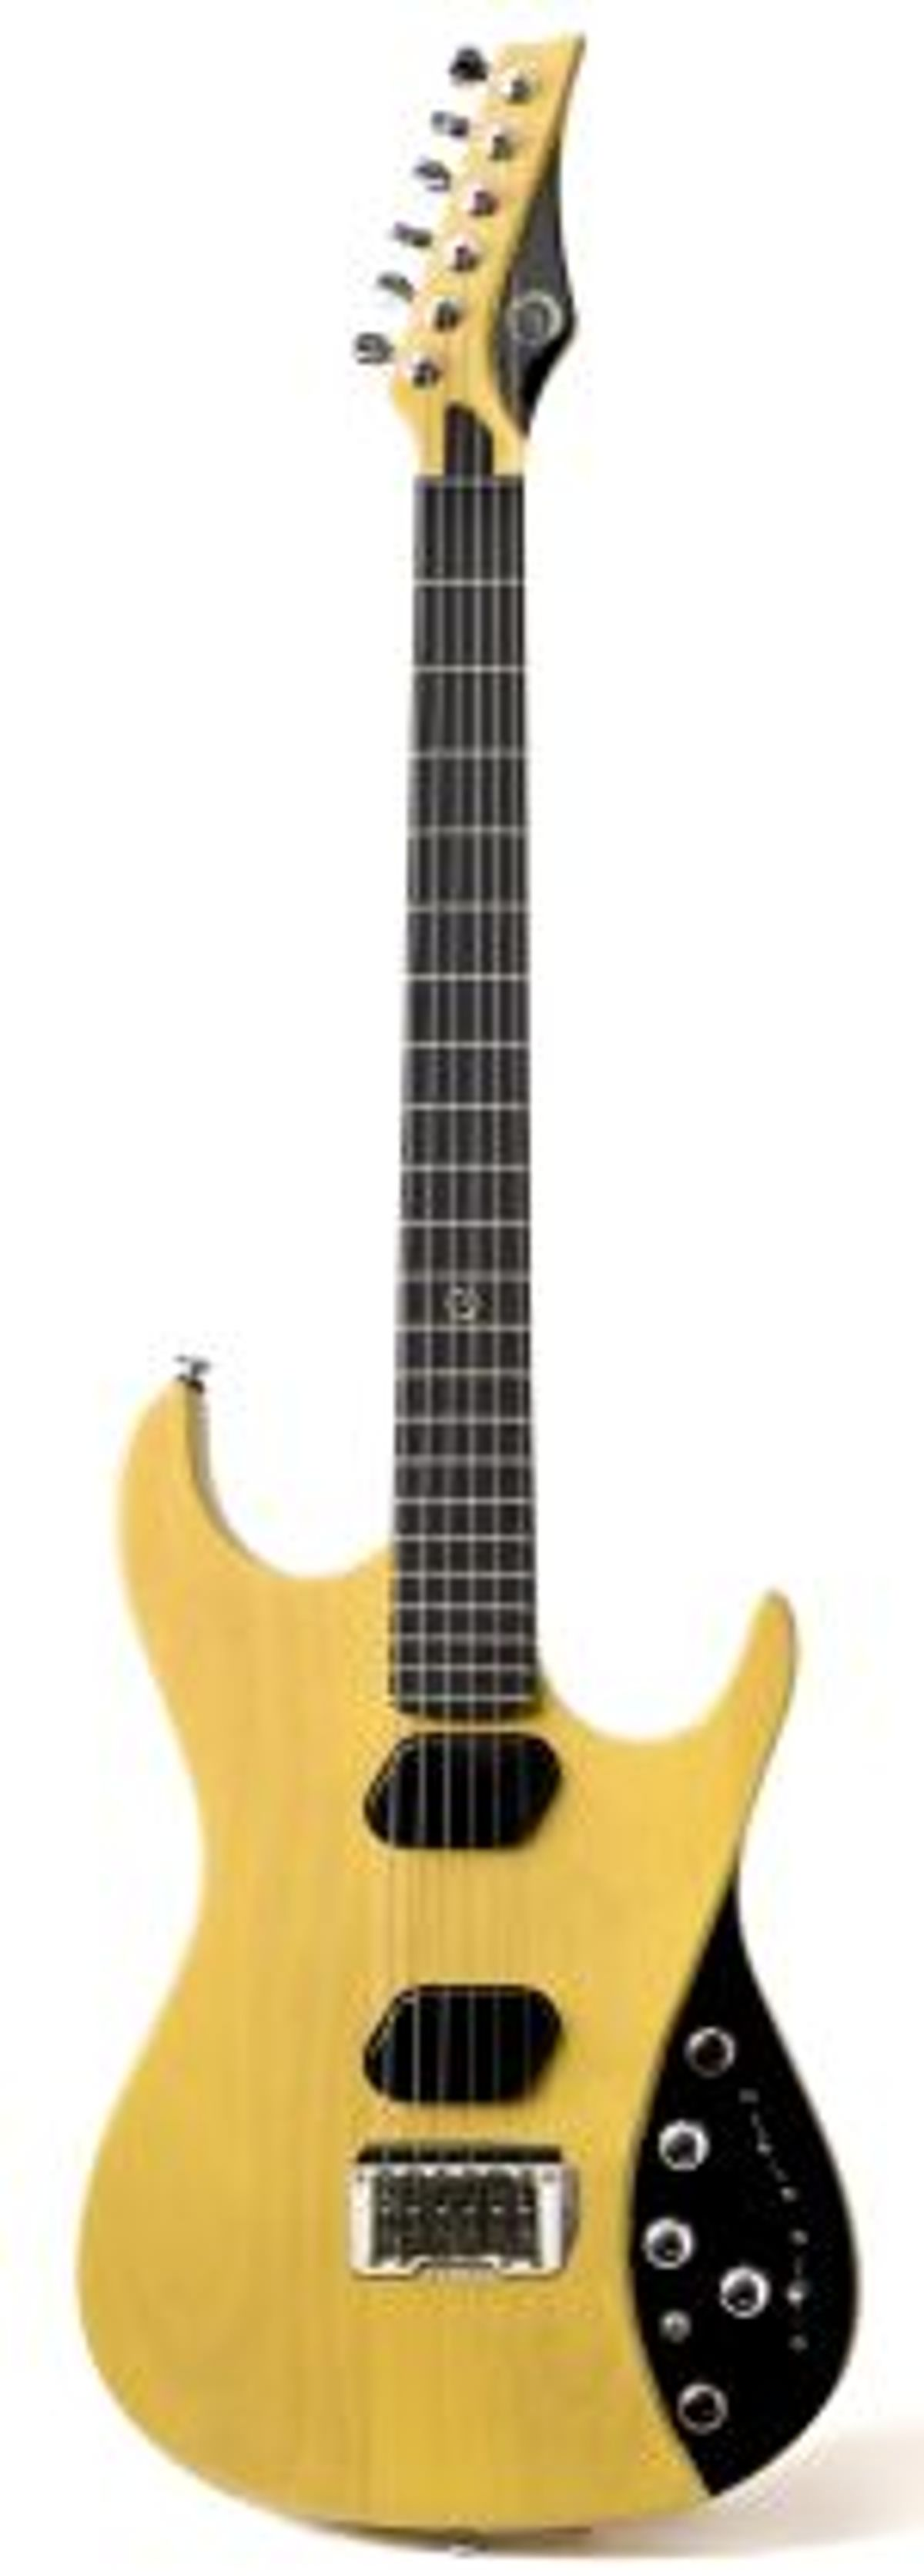 Moog Launches The Moog Guitar - Model E1